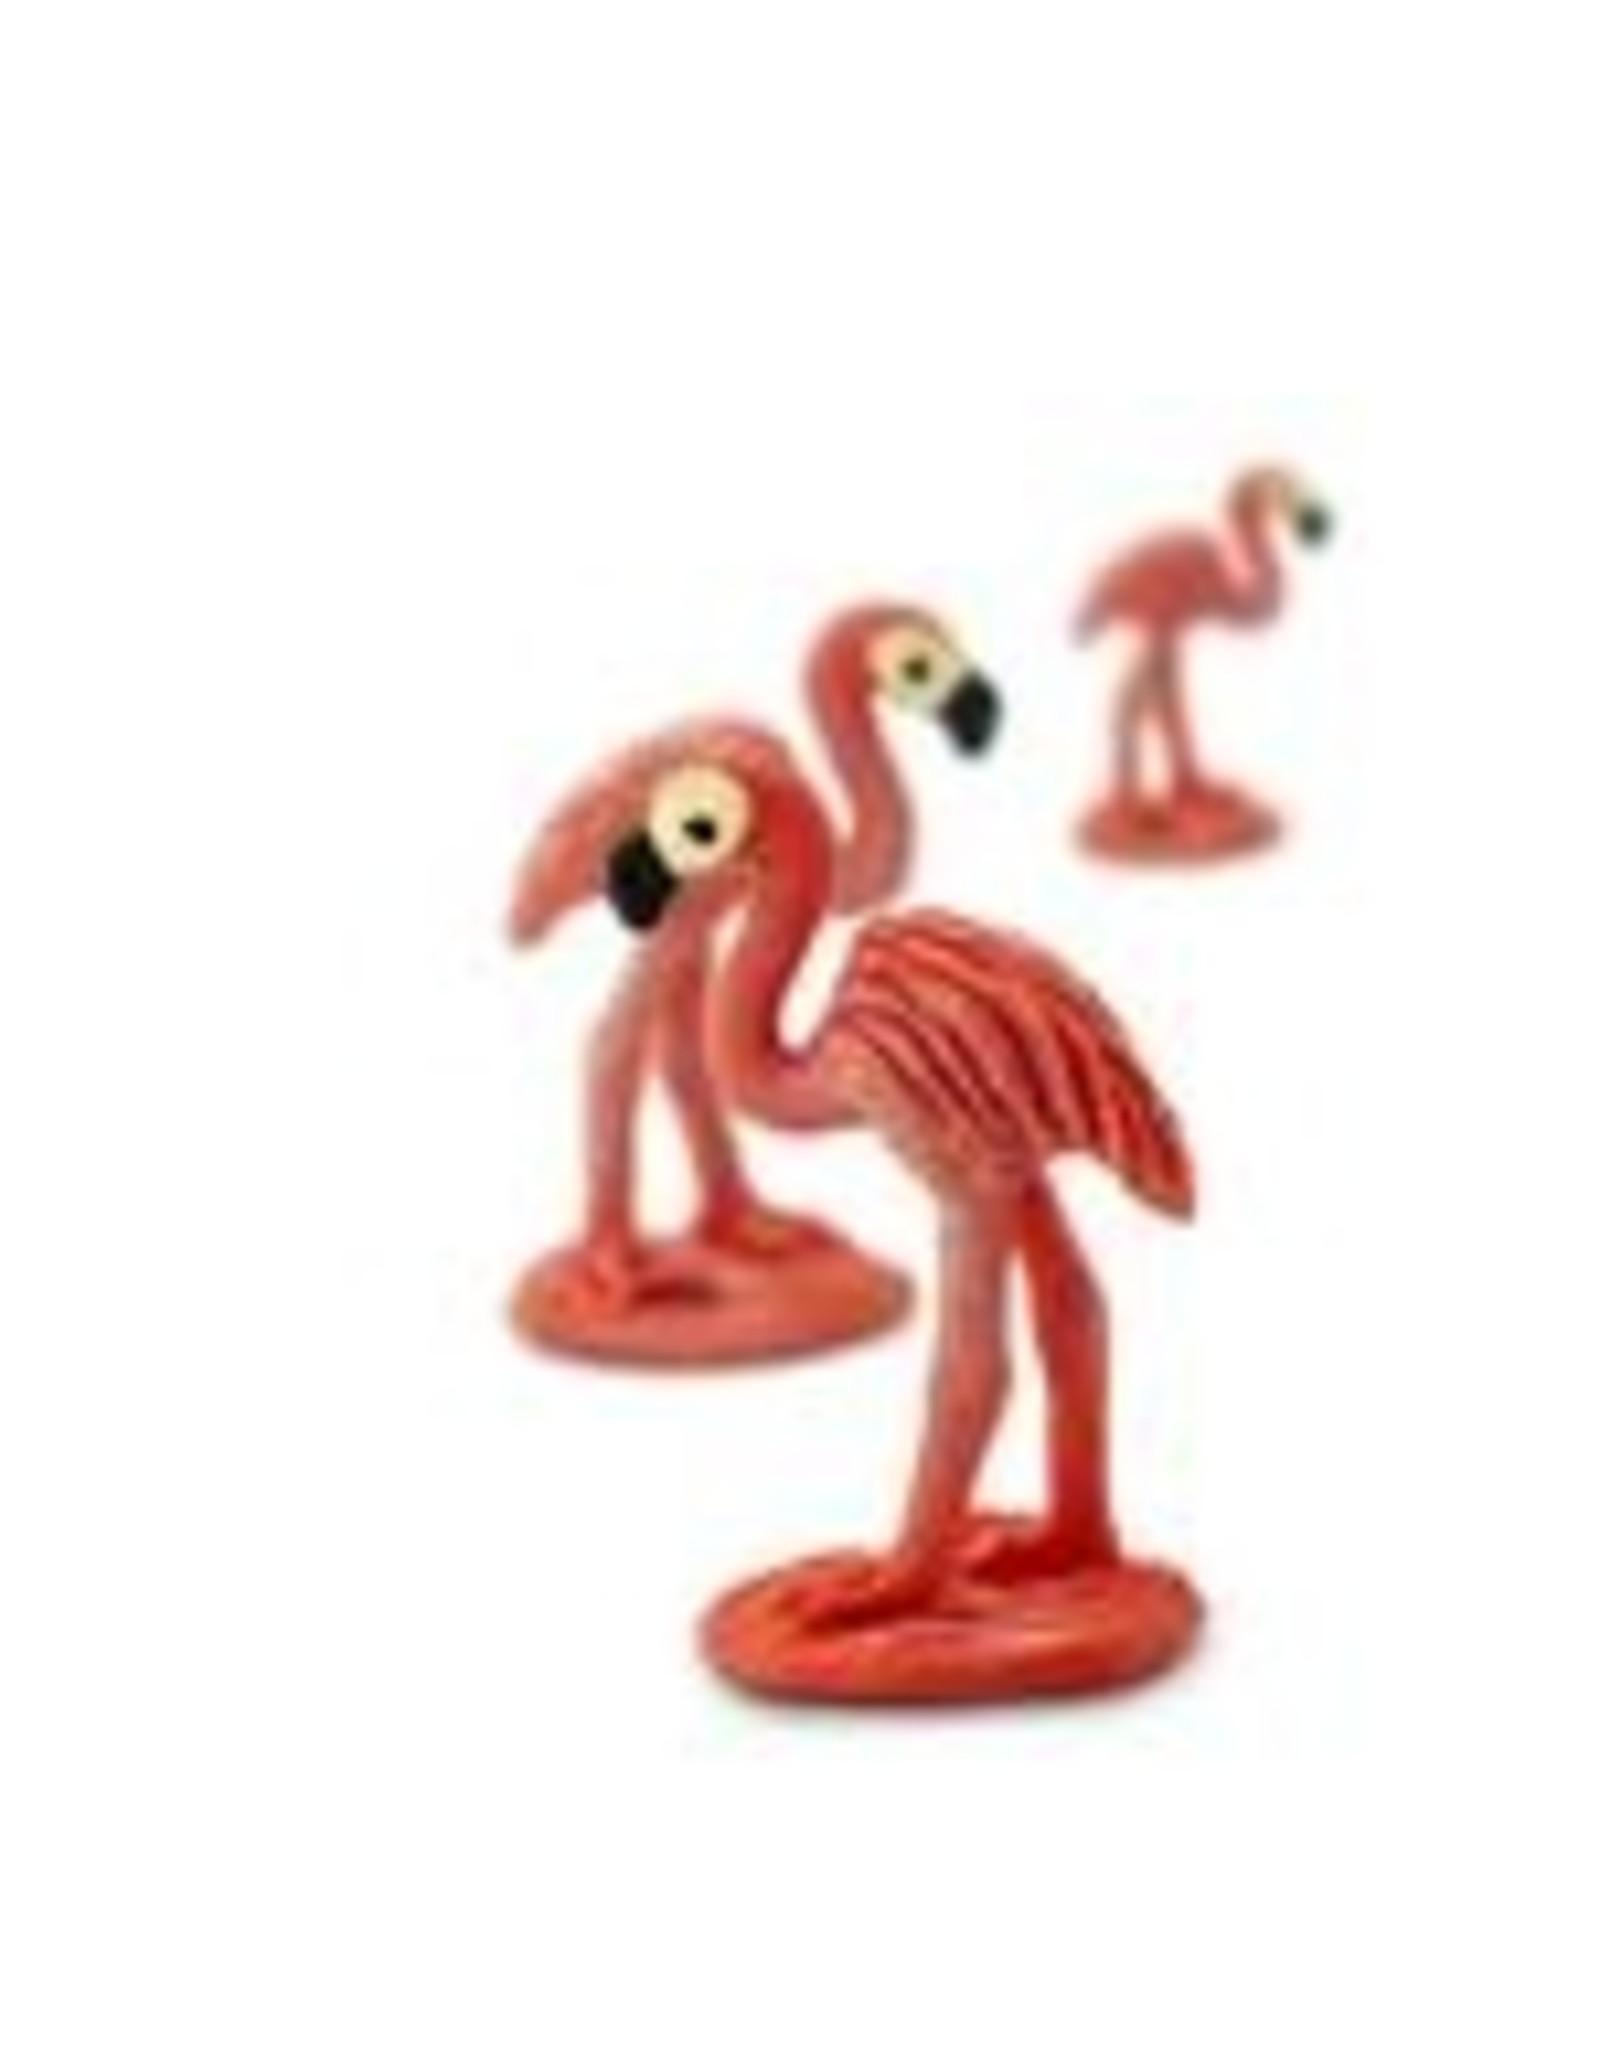 Goodluck mini - flamingo